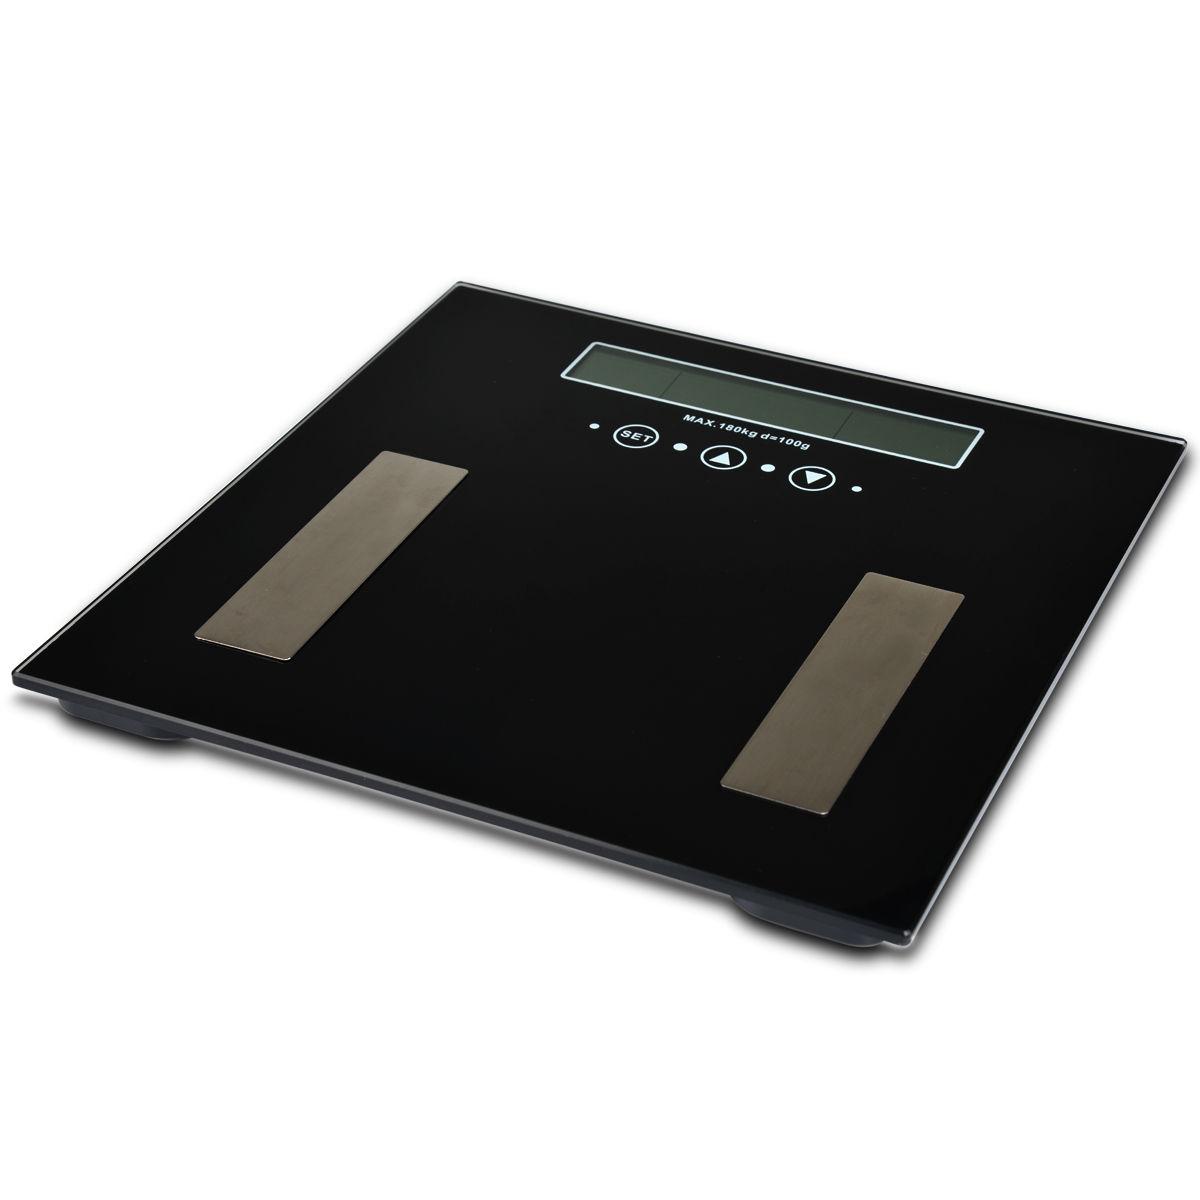 measure body fat percentage app